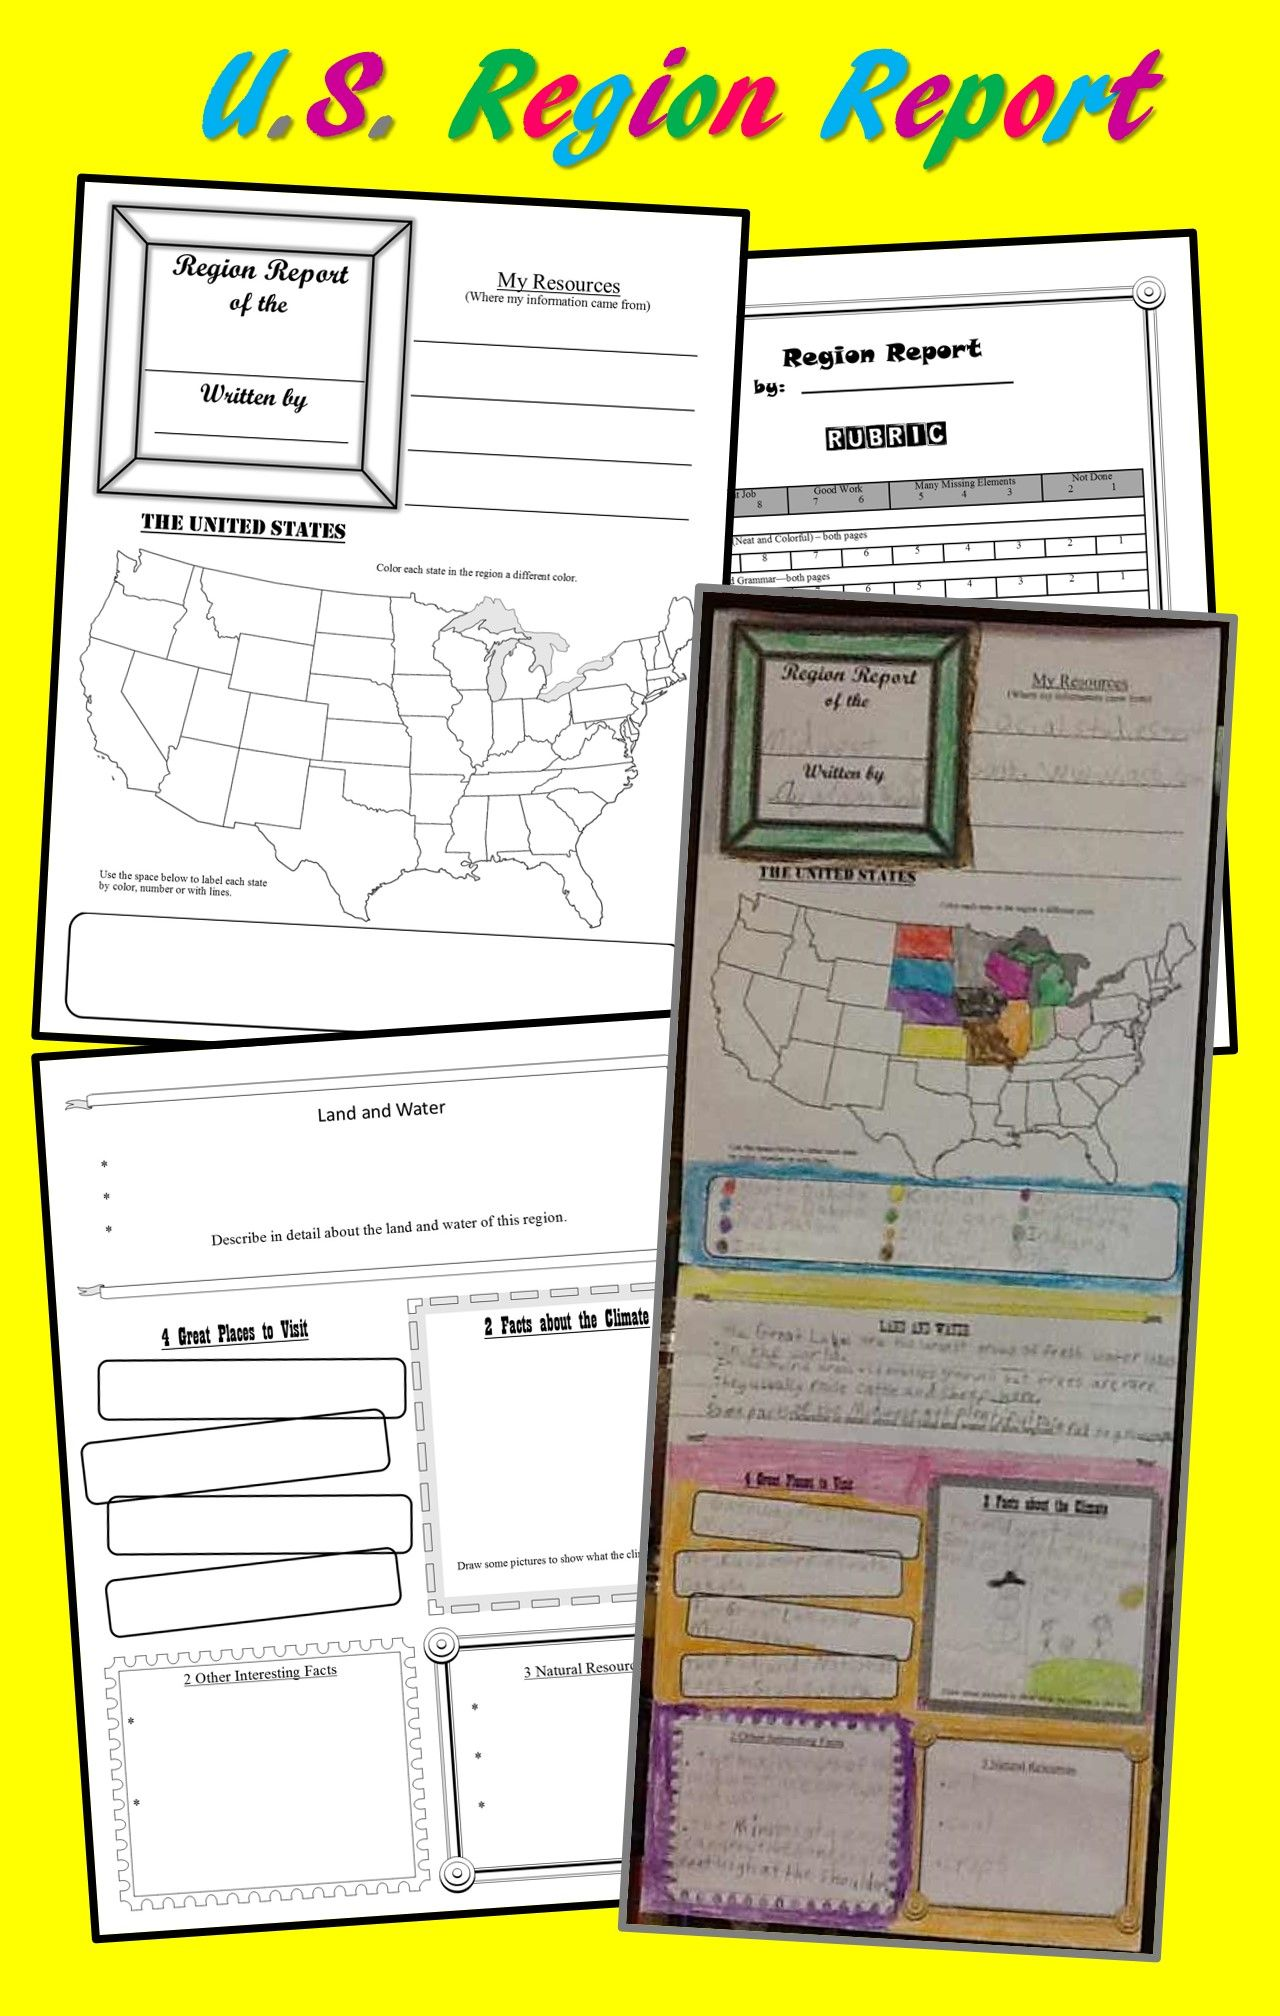 hight resolution of U.S. Region Report (Poster) Template for Intermediate Grades   Homeschool social  studies